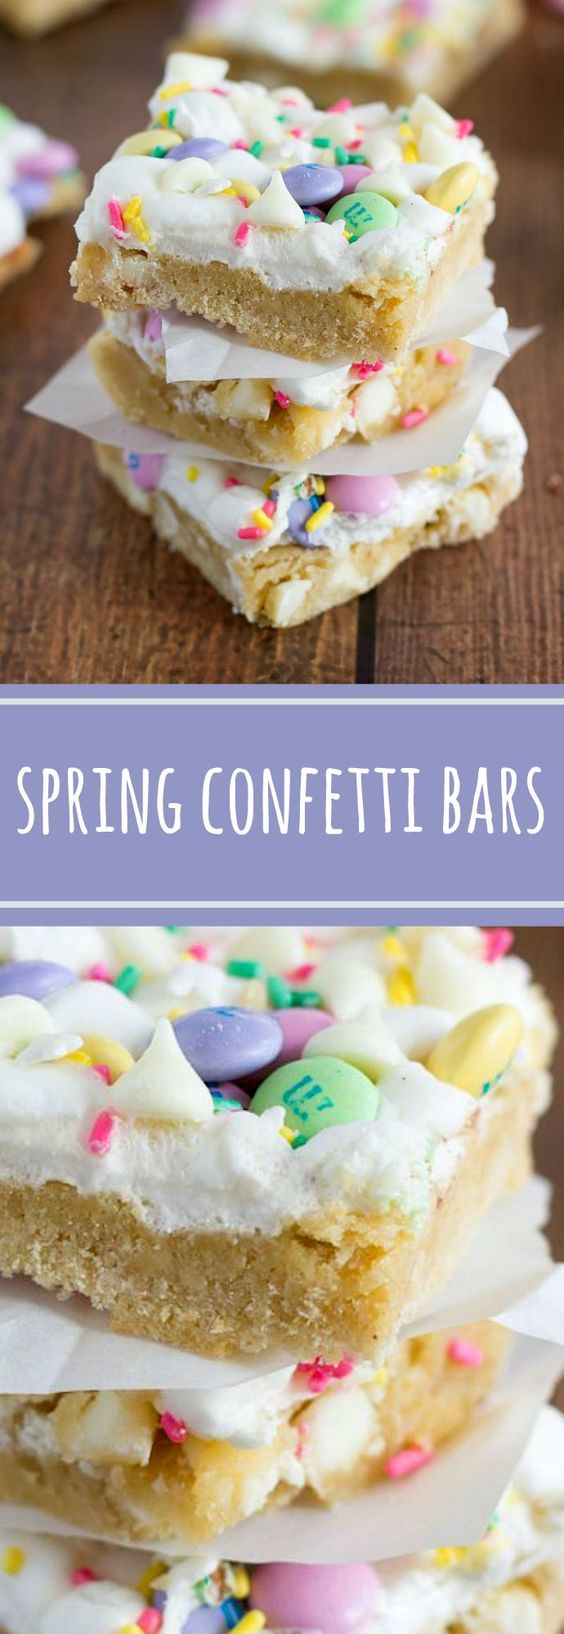 Spring Confetti Bars Dessert Recipe via Chelsea's Messy Apron - Confetti bars made with Spring colored M&M's, white chocolate, Spring sprinkles, and gooey marshmallows.